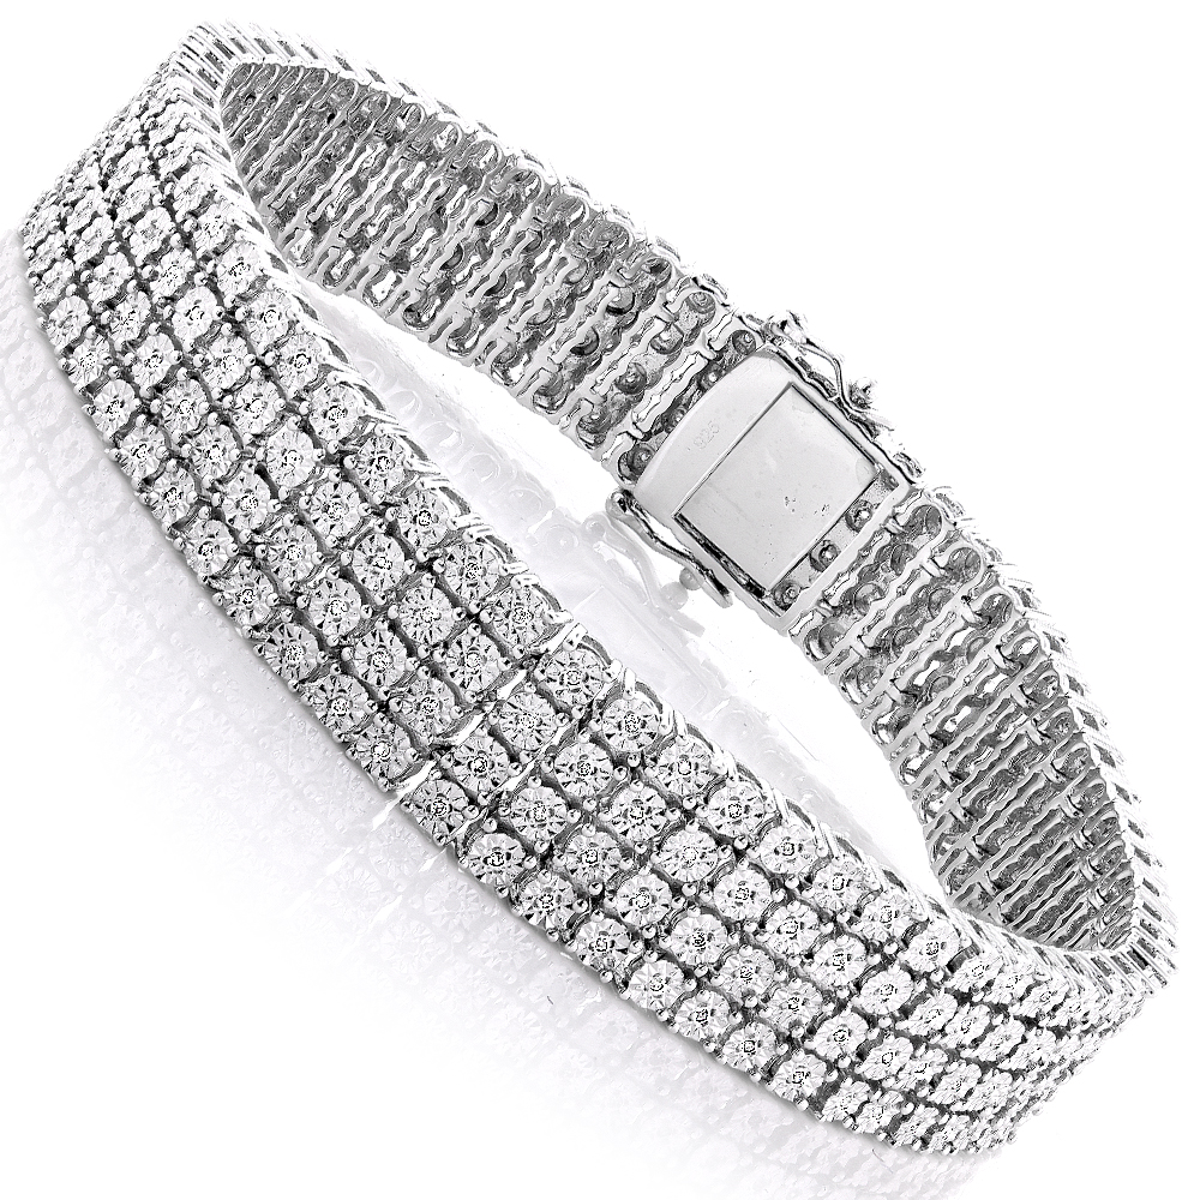 Mens Sterling Silver Bracelets: 4 Row Diamond Bracelet 0.63ct